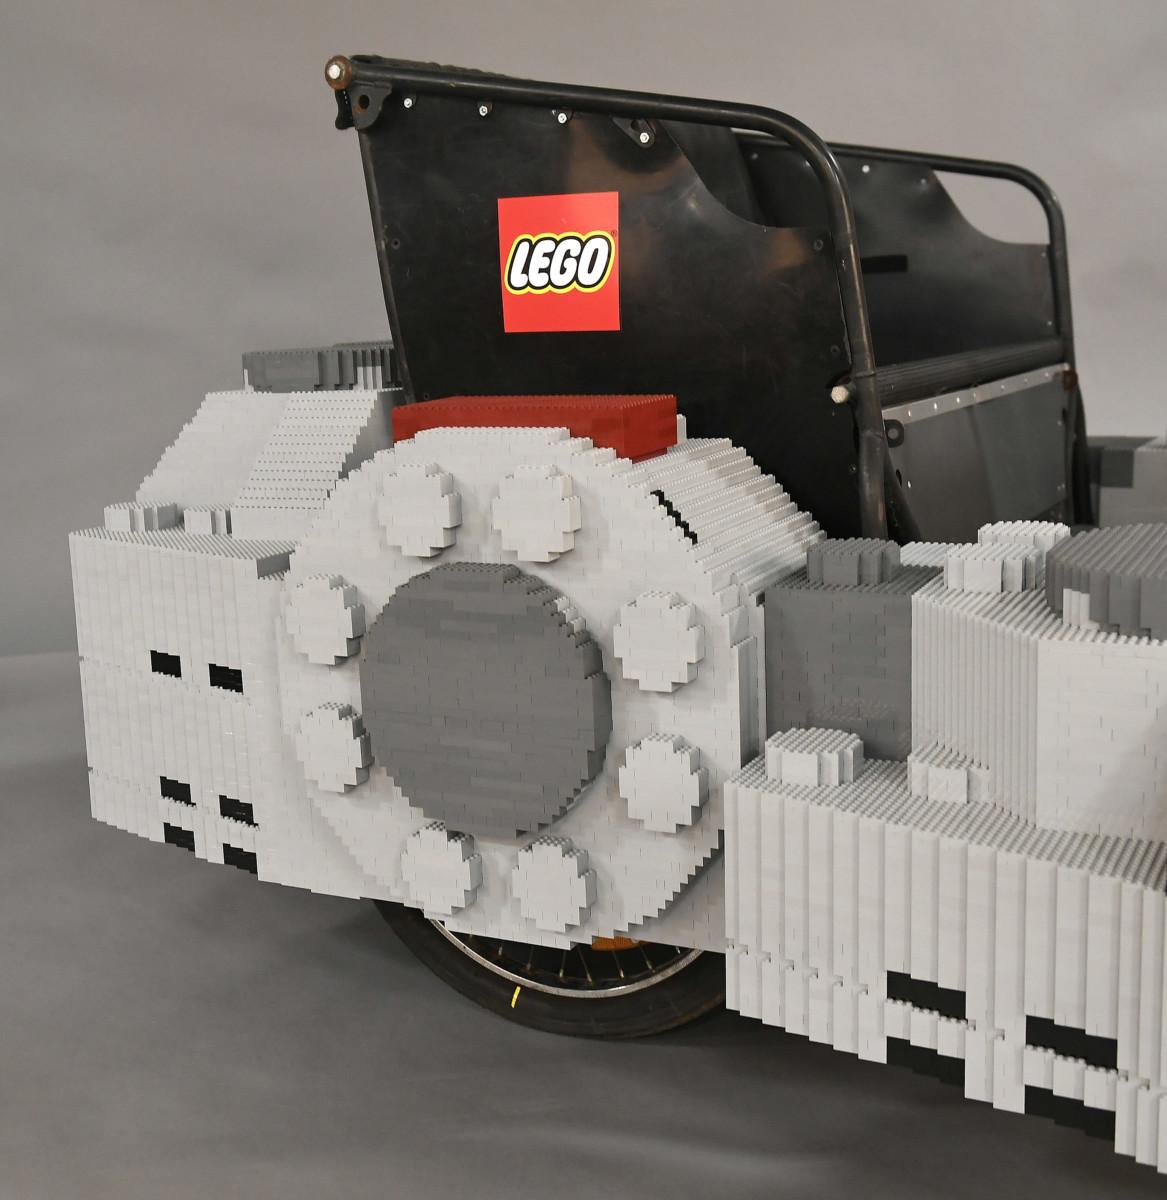 THE LEGO GROUP TAKES FLIGHT 6